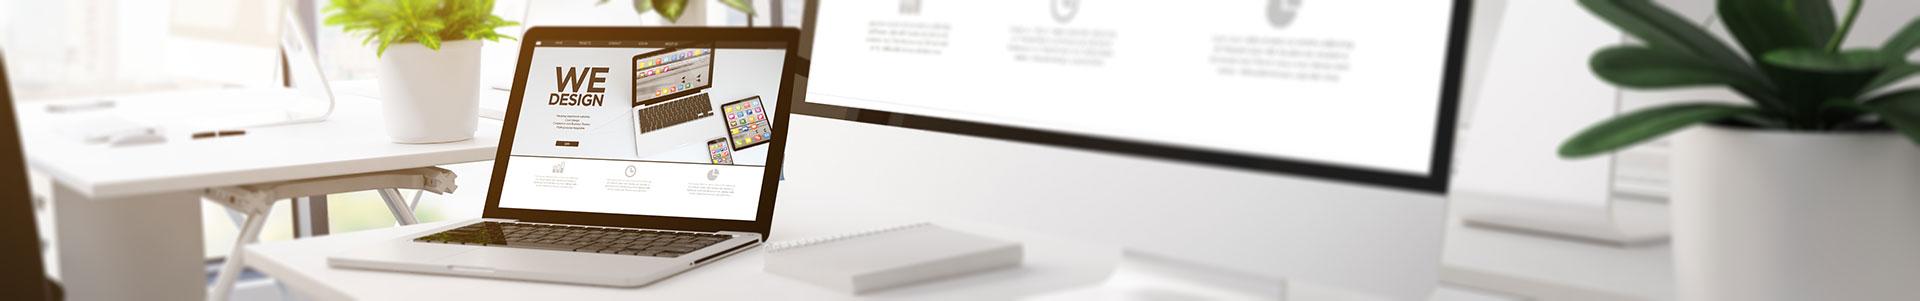 website design digital marketing | Navarro Creative Group